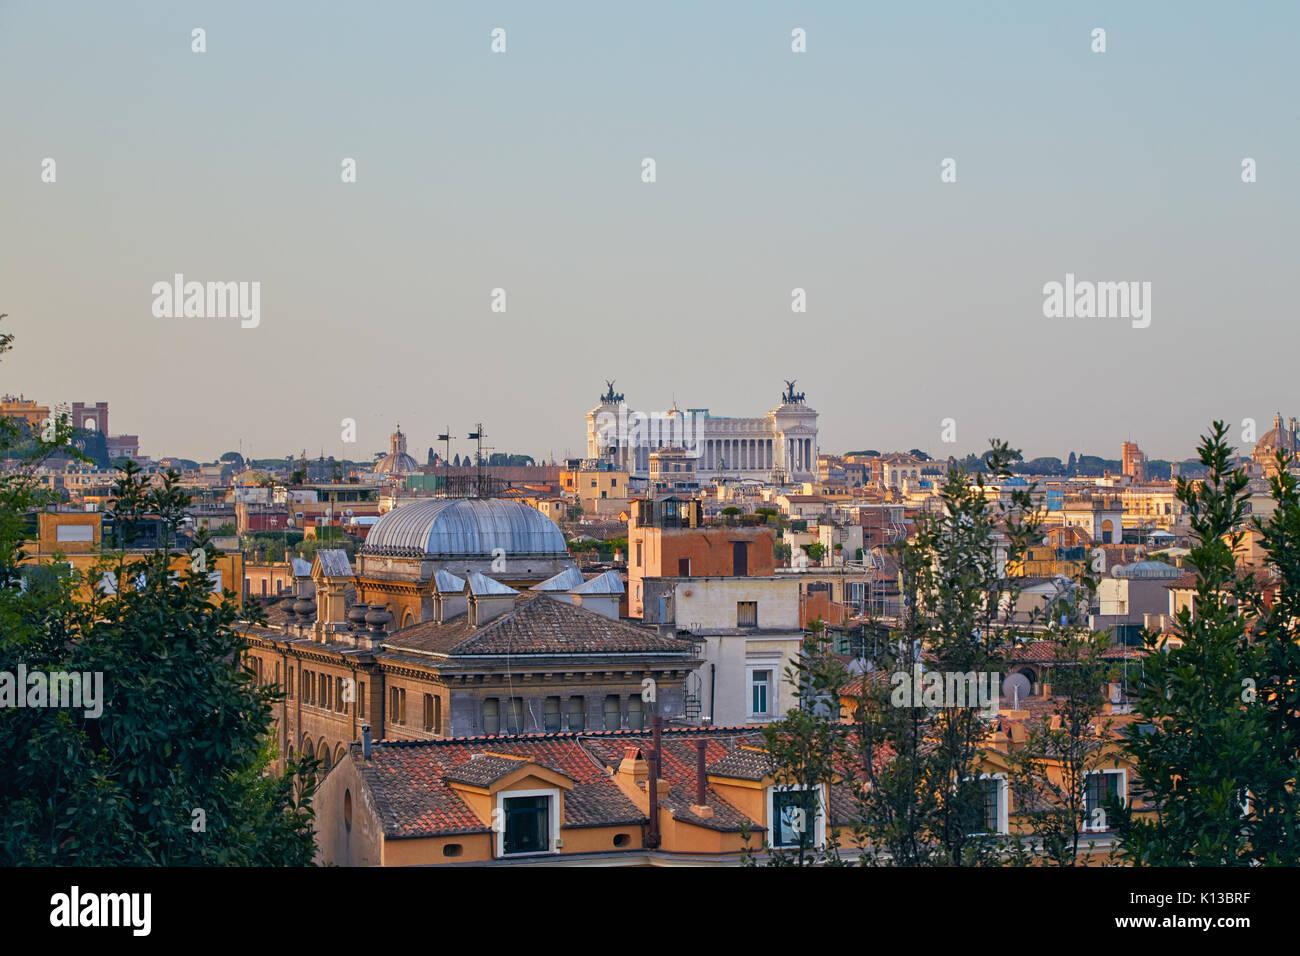 Matin panorama de Rome avec une vue sur le monument Vittoriano Photo Stock